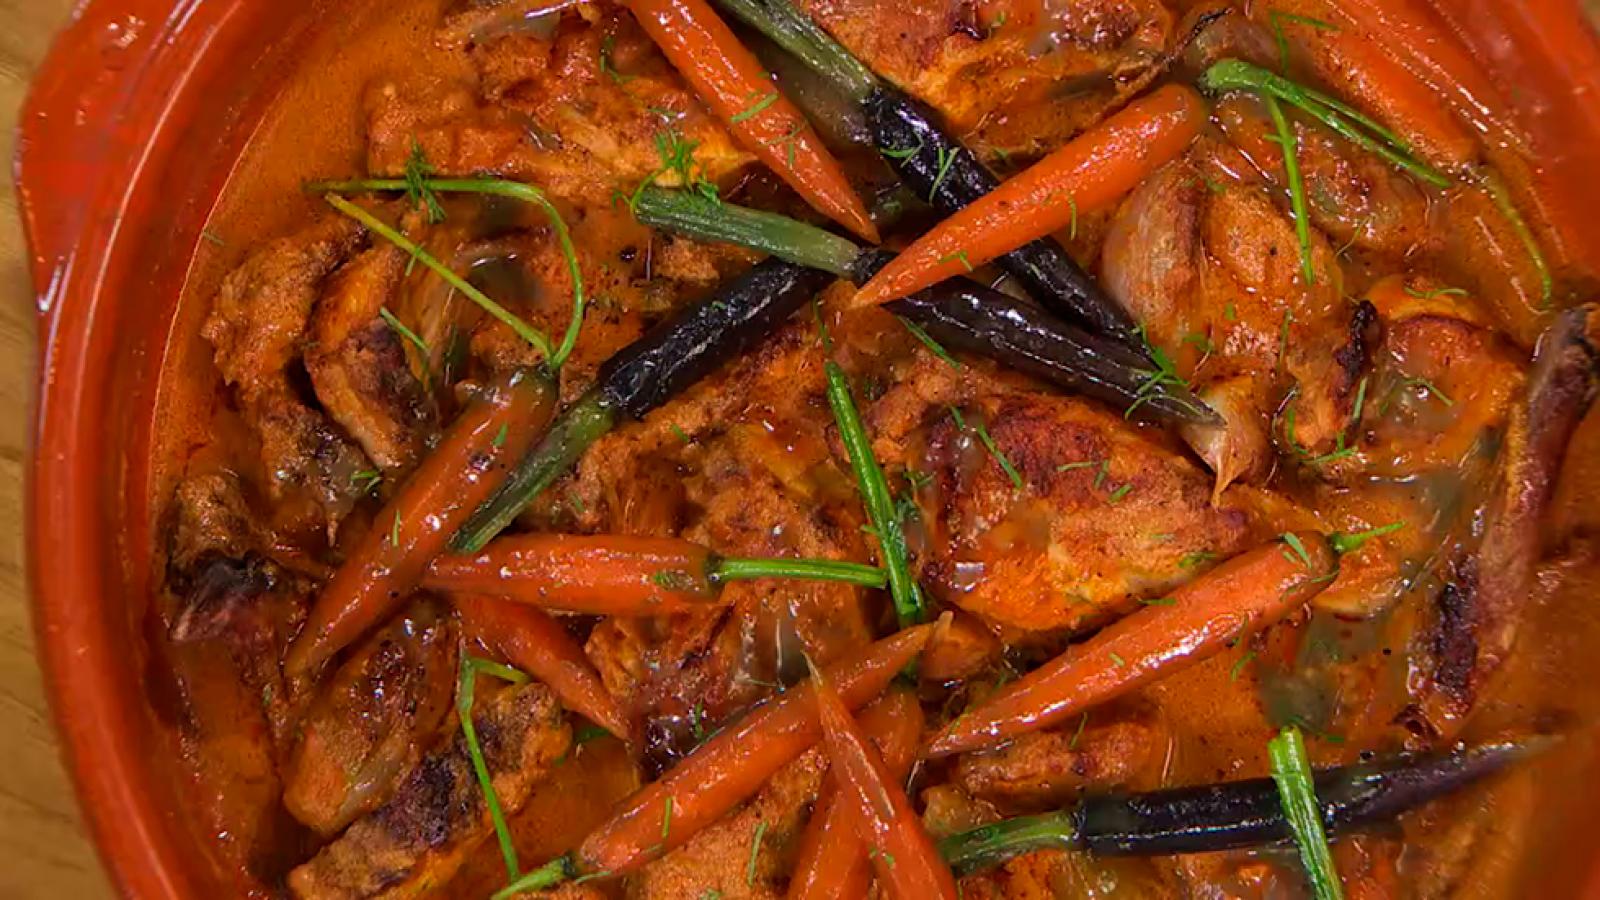 Receta de conejo asado con zanahorias